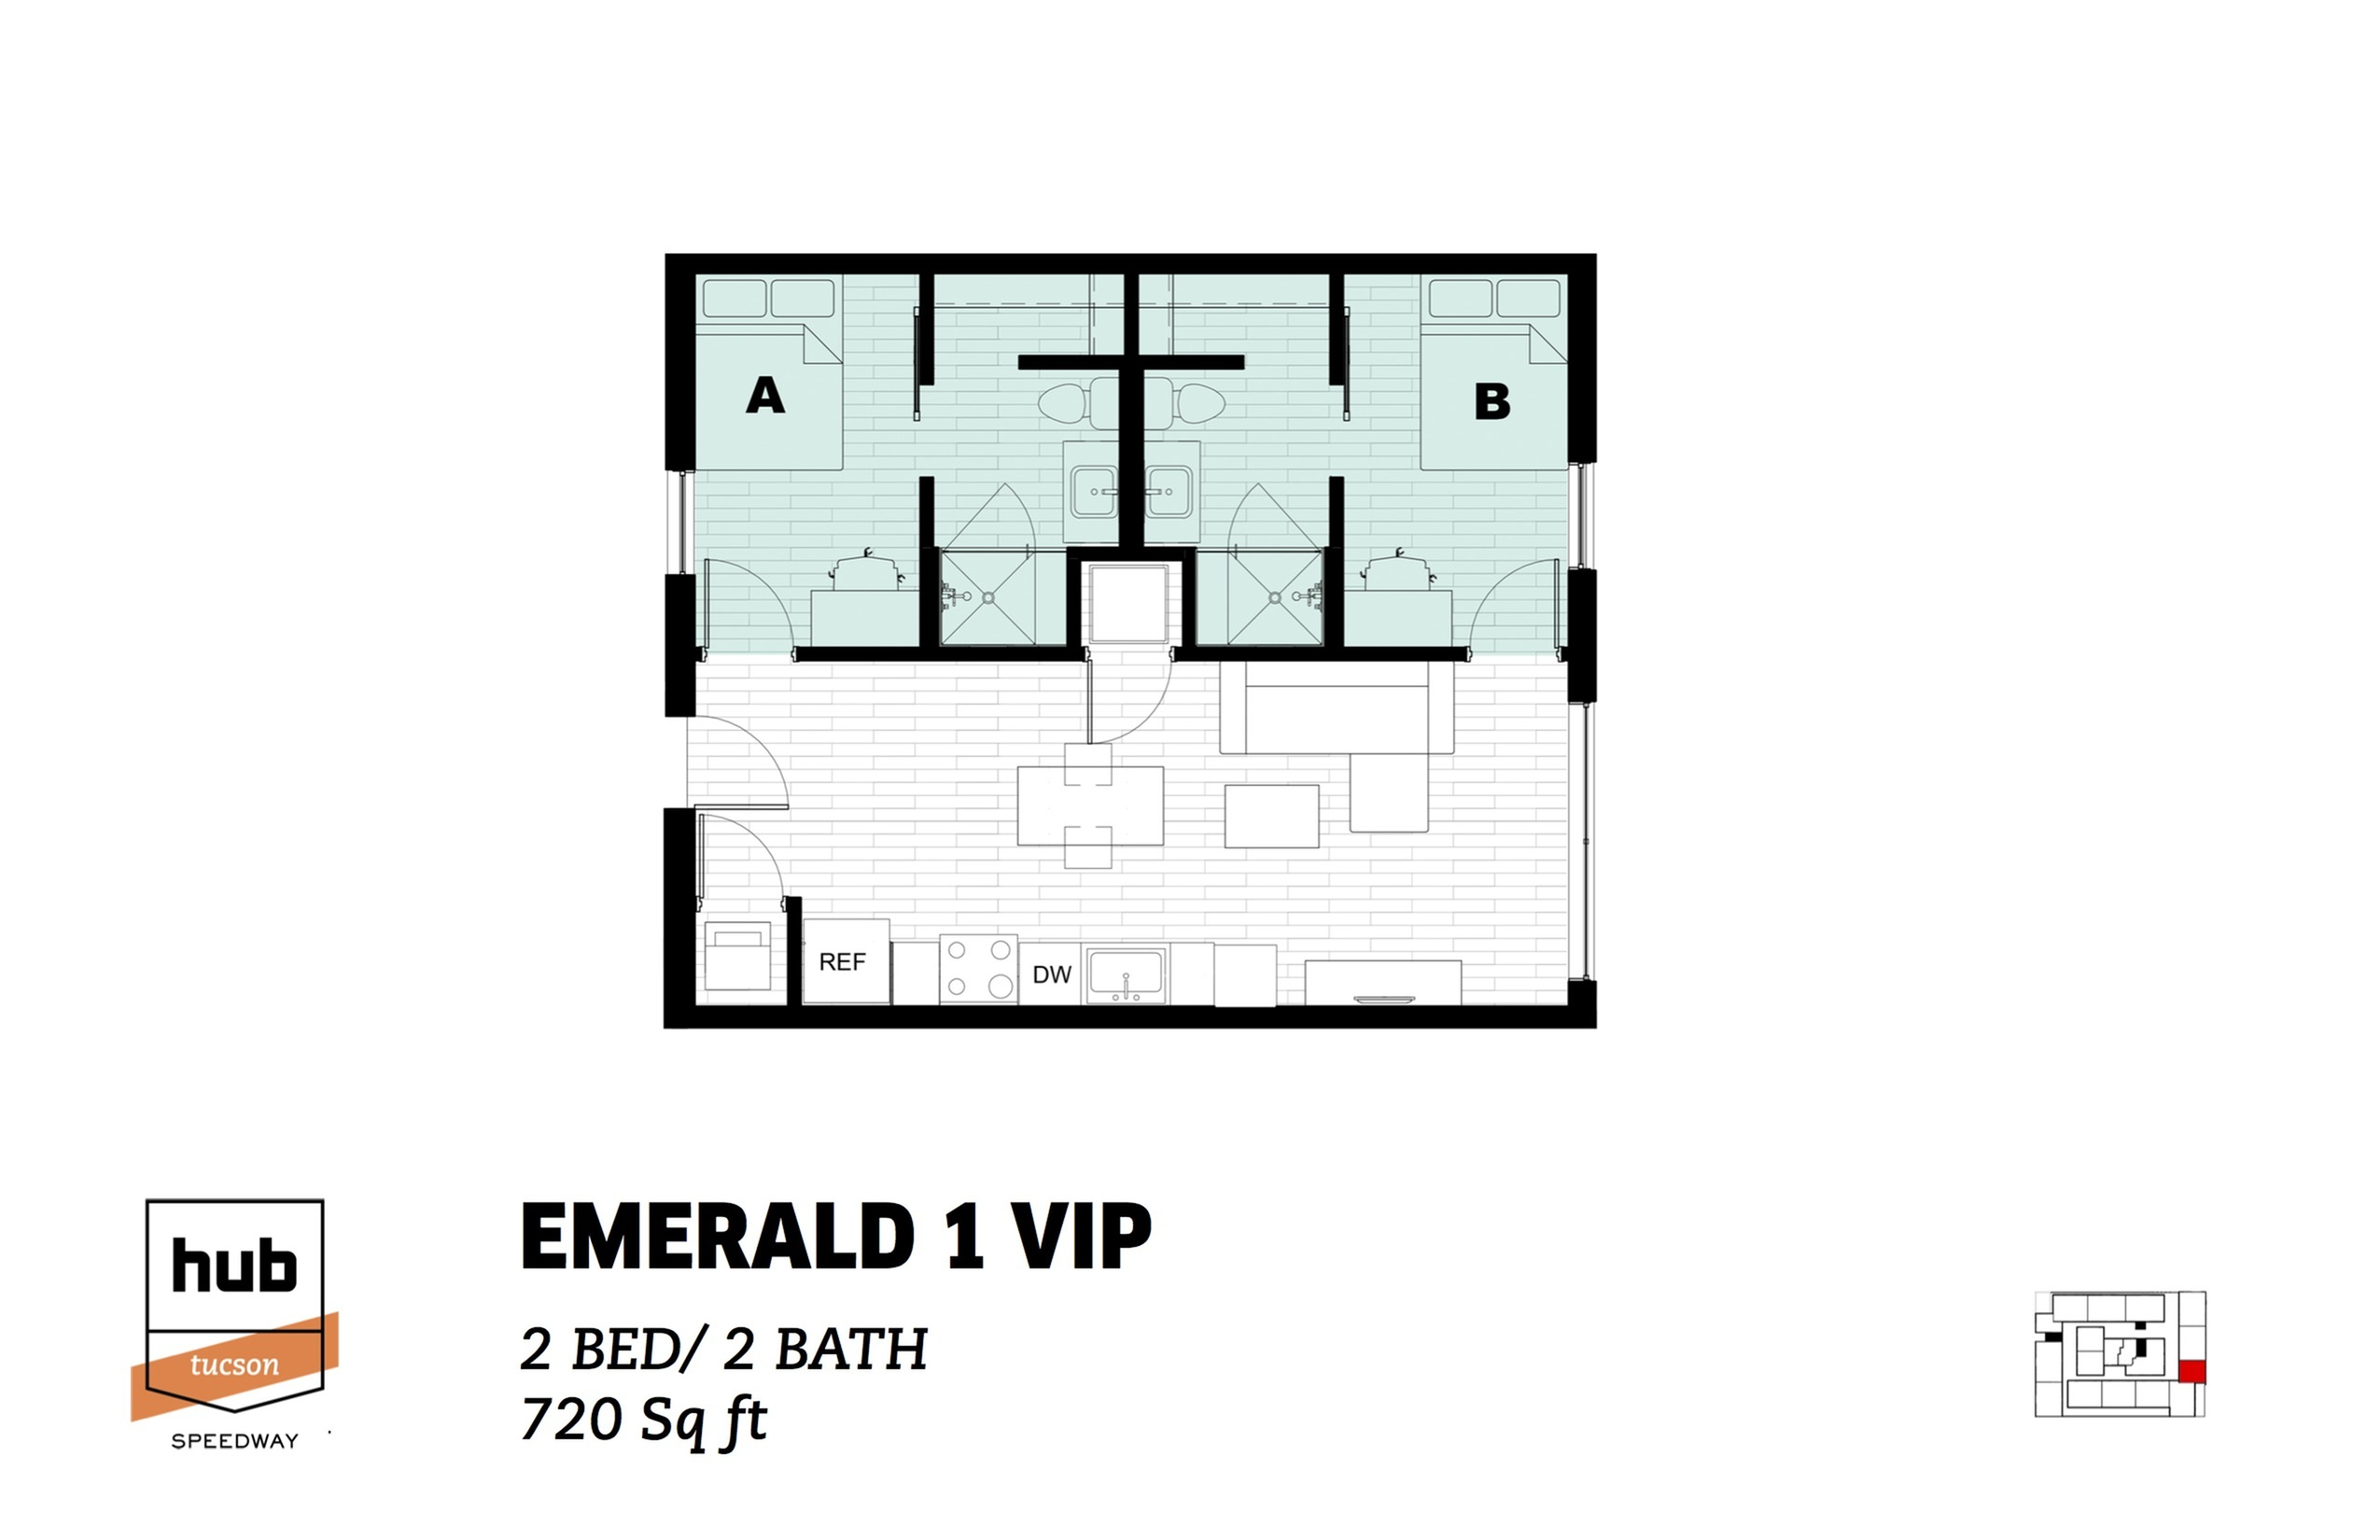 Emerald 1 VIP